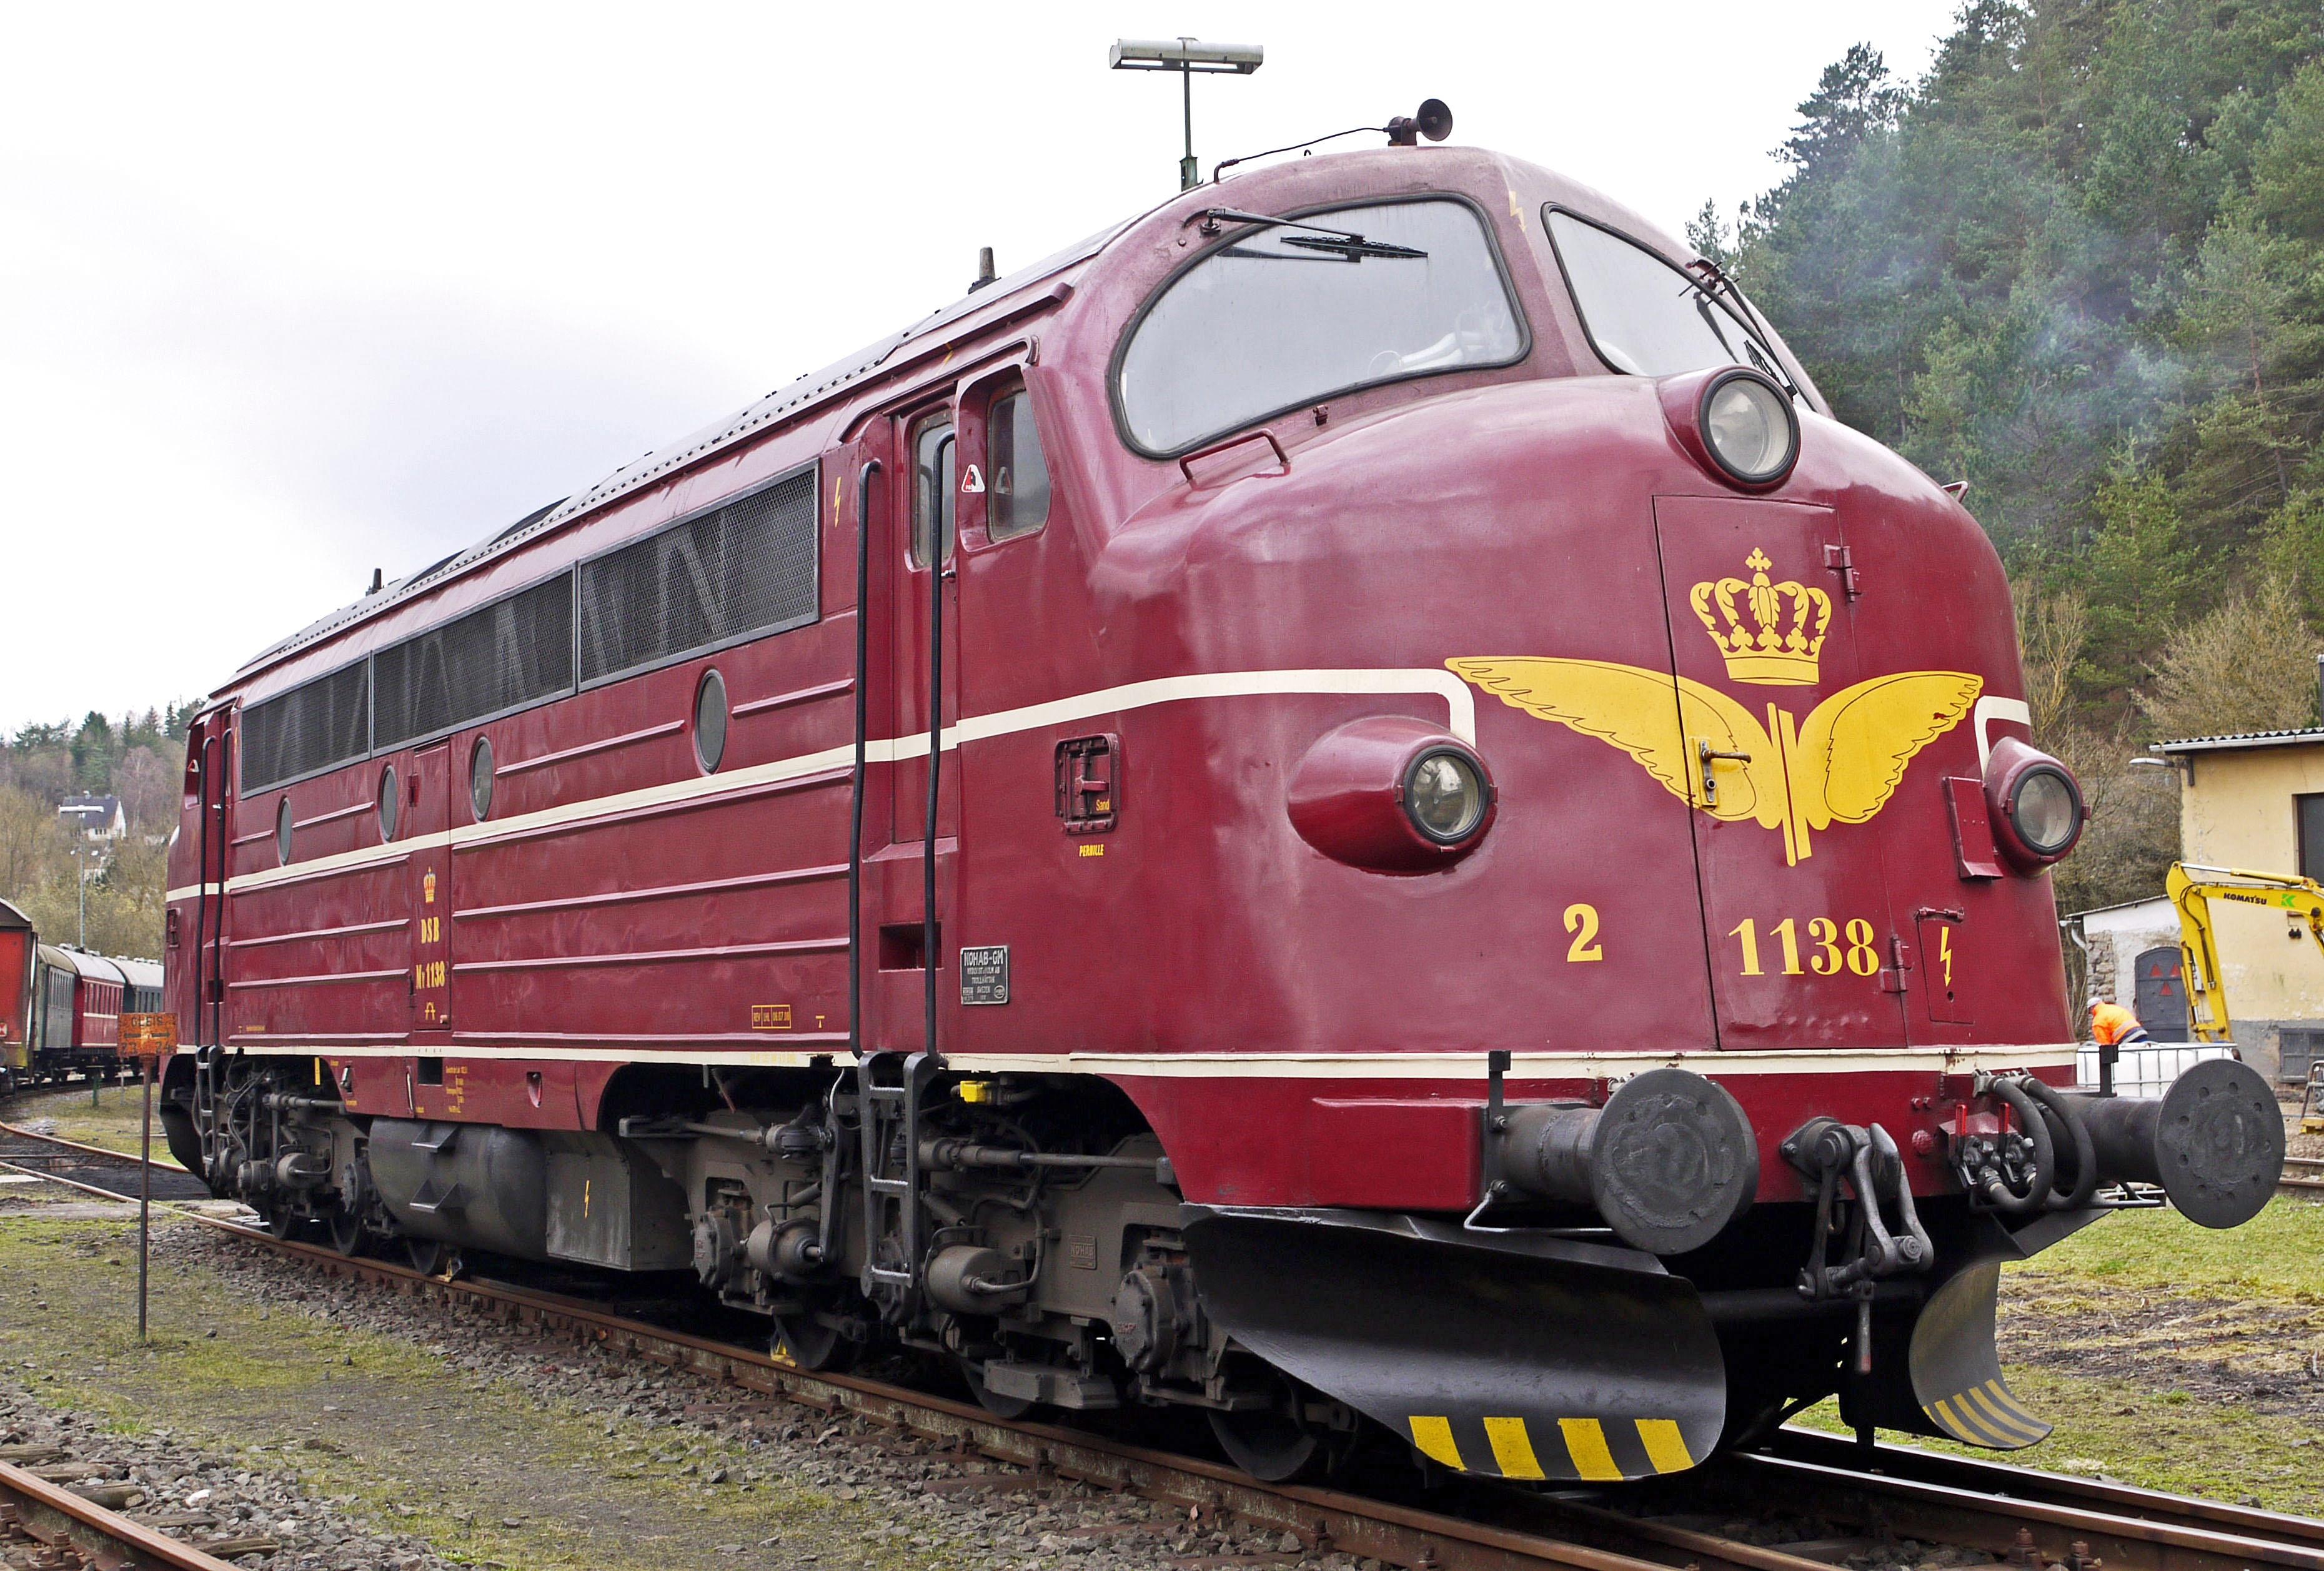 Kostenlose foto : Spur, Zug, Transport, Fahrzeug, Nostalgie, Bw ...